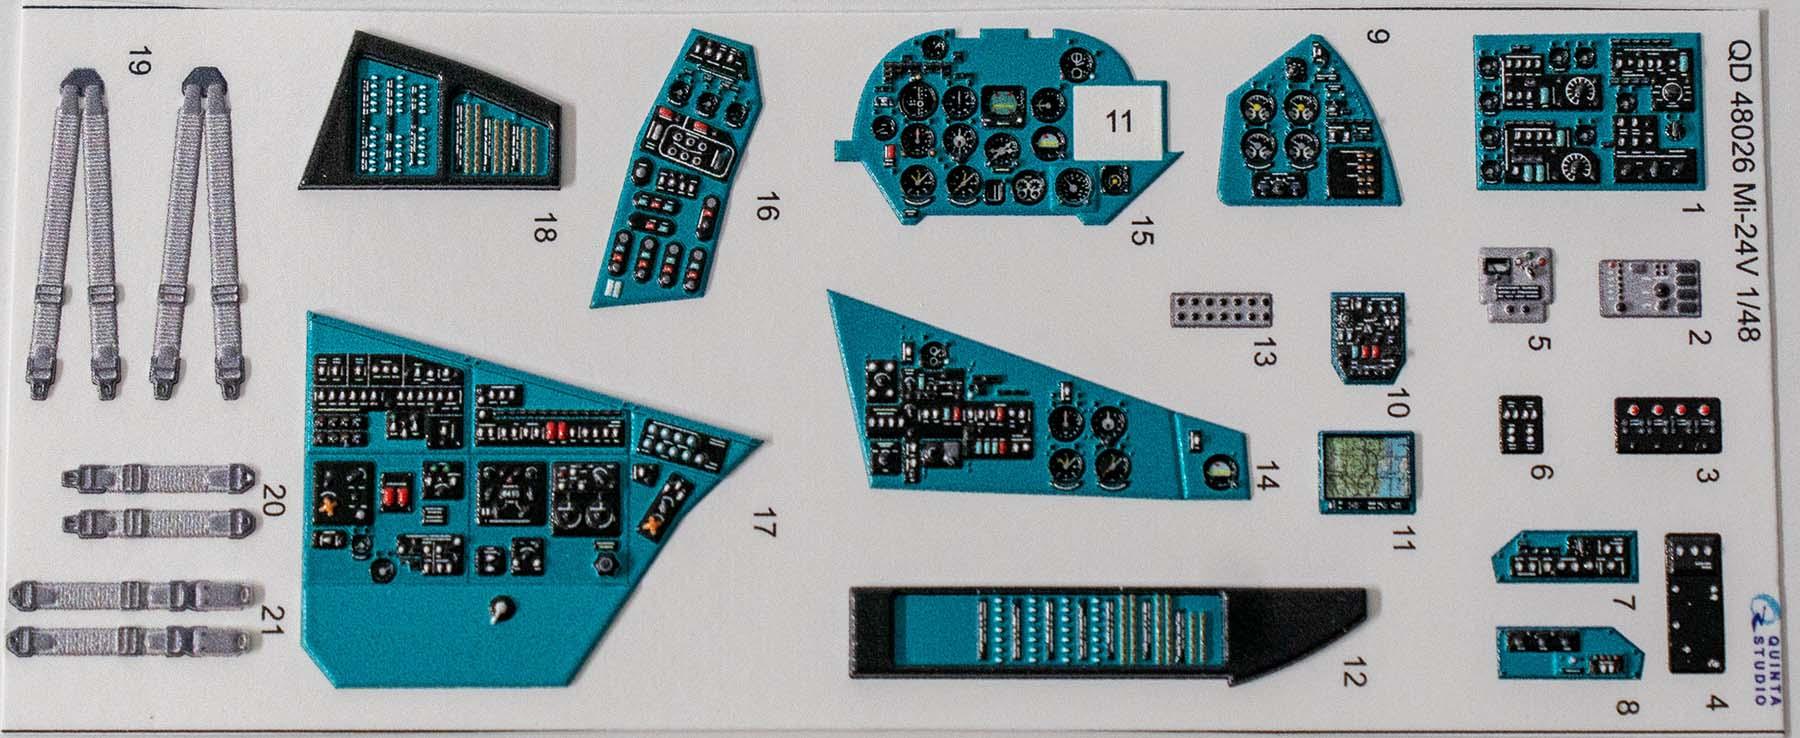 qs_qd48026_parts1.jpg